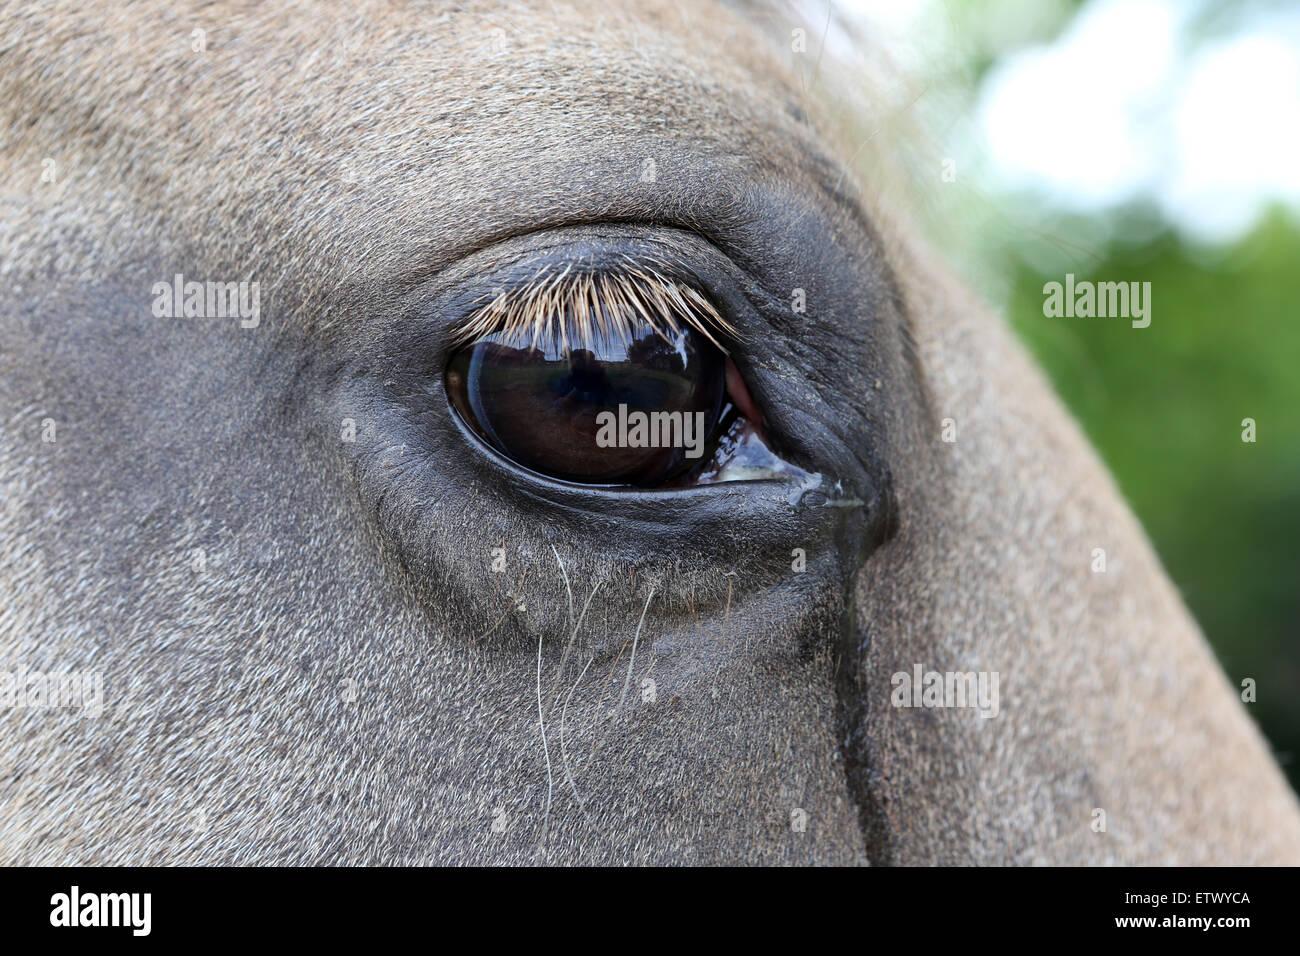 Werl, Germany, Bleeding Eye of a horse - Stock Image